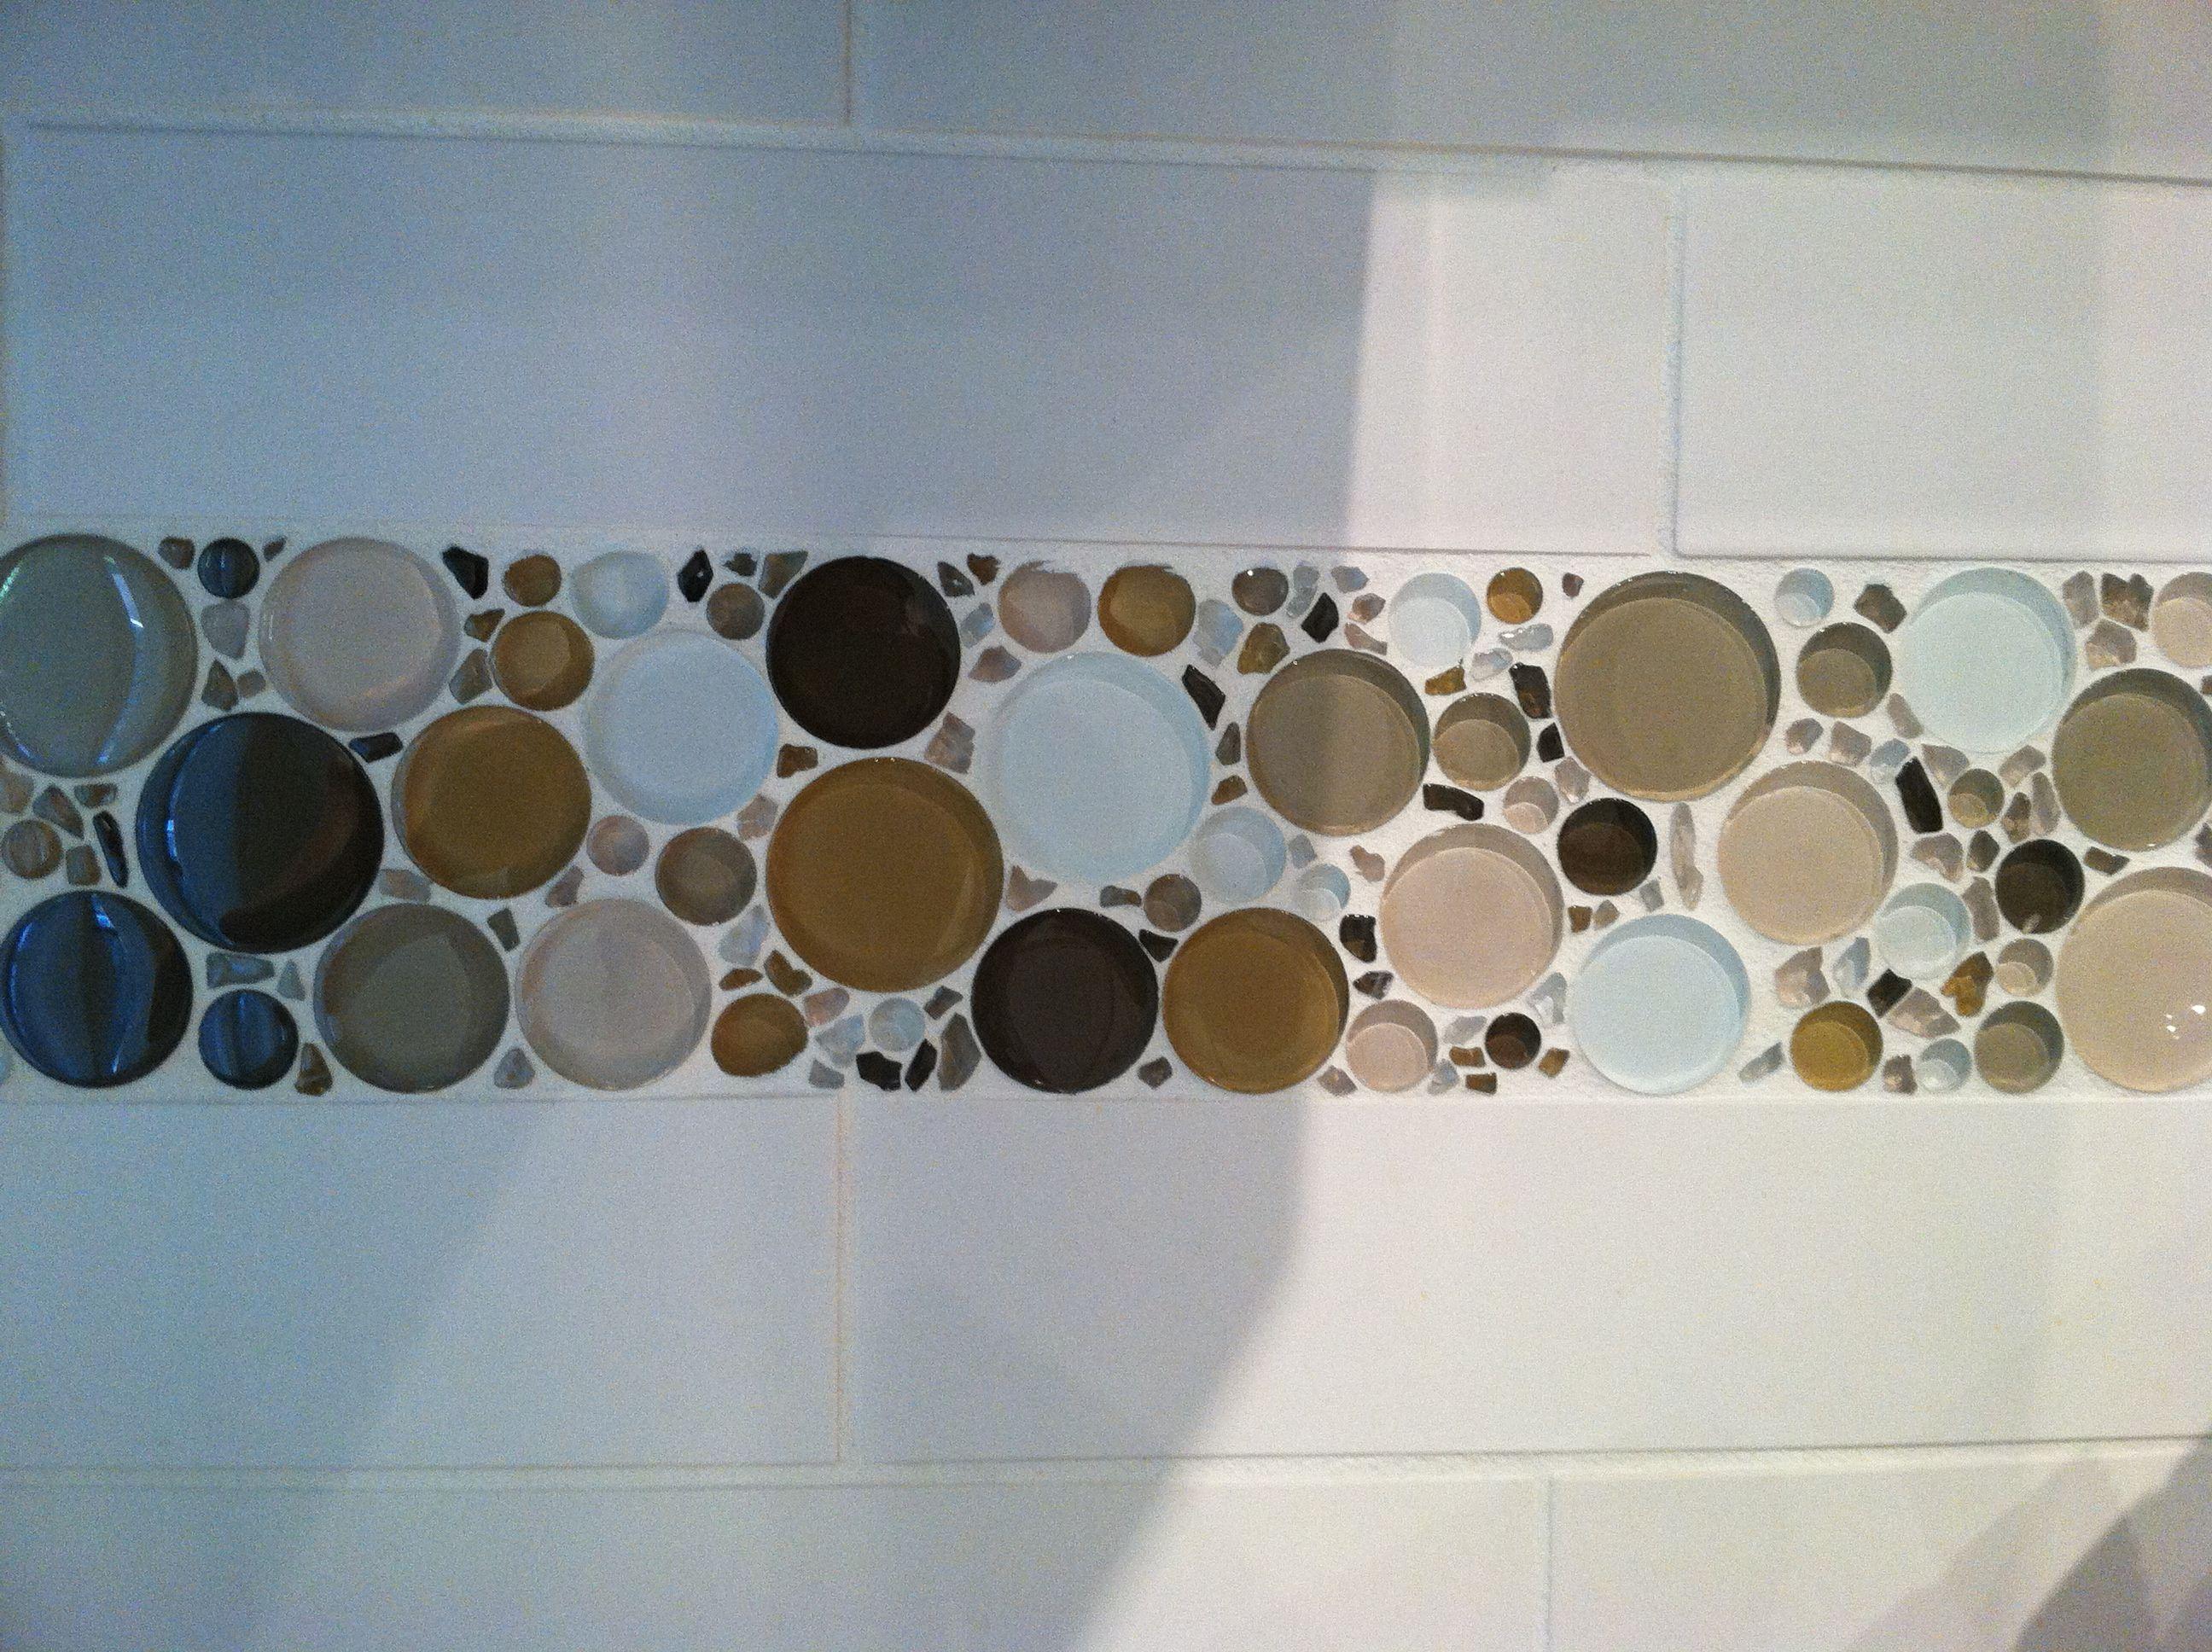 Kitchen Tile Detail Strip Of Round Bubbles Amongst